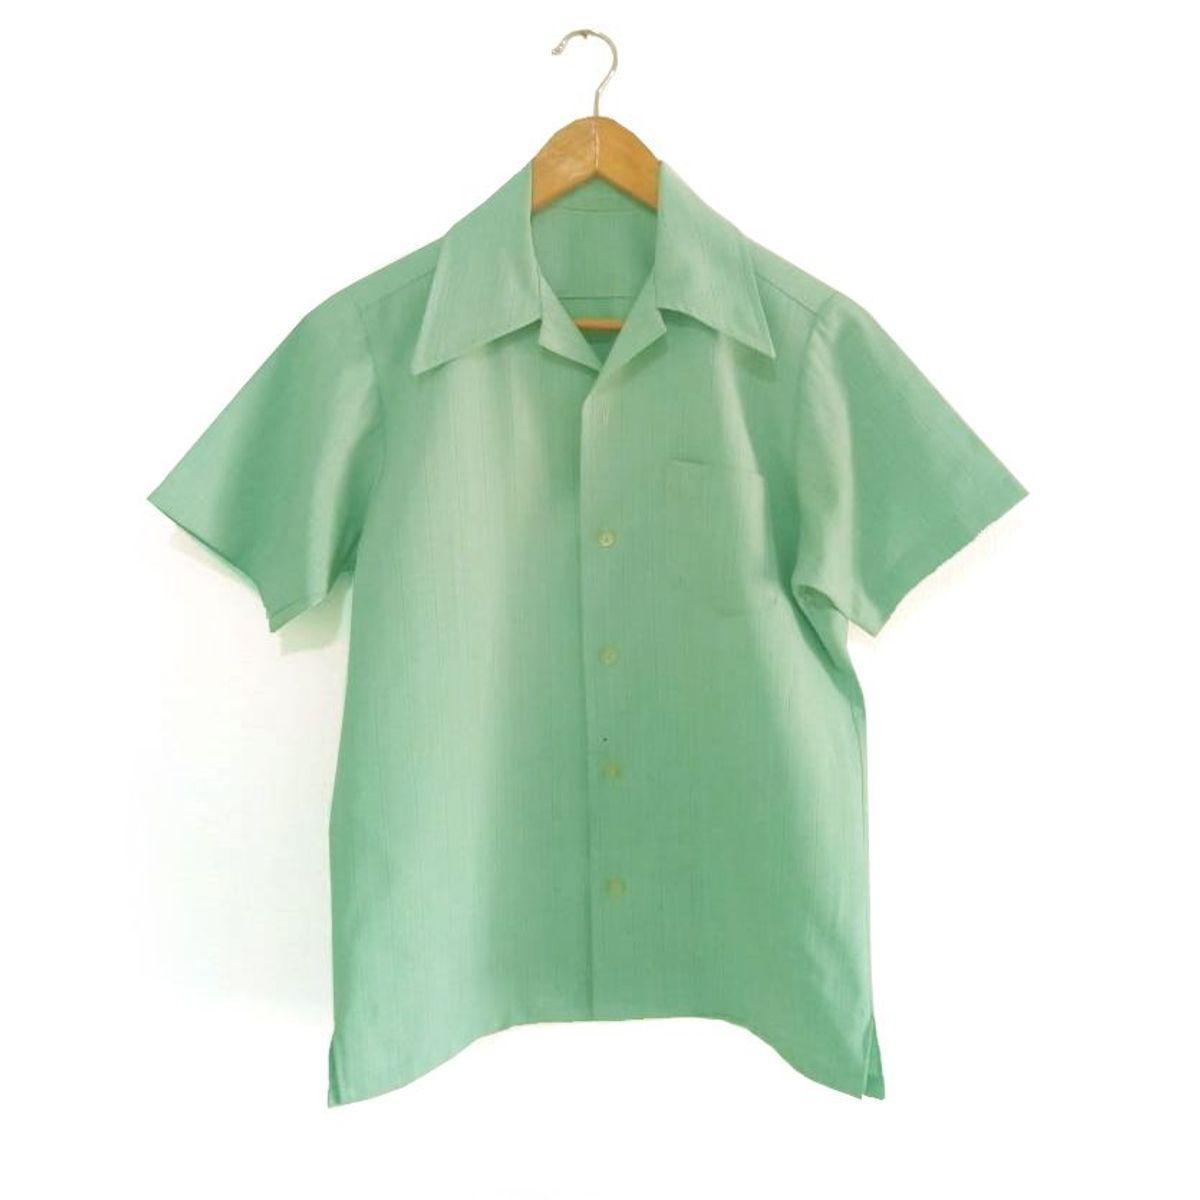 camisa vintage - camisas sem marca